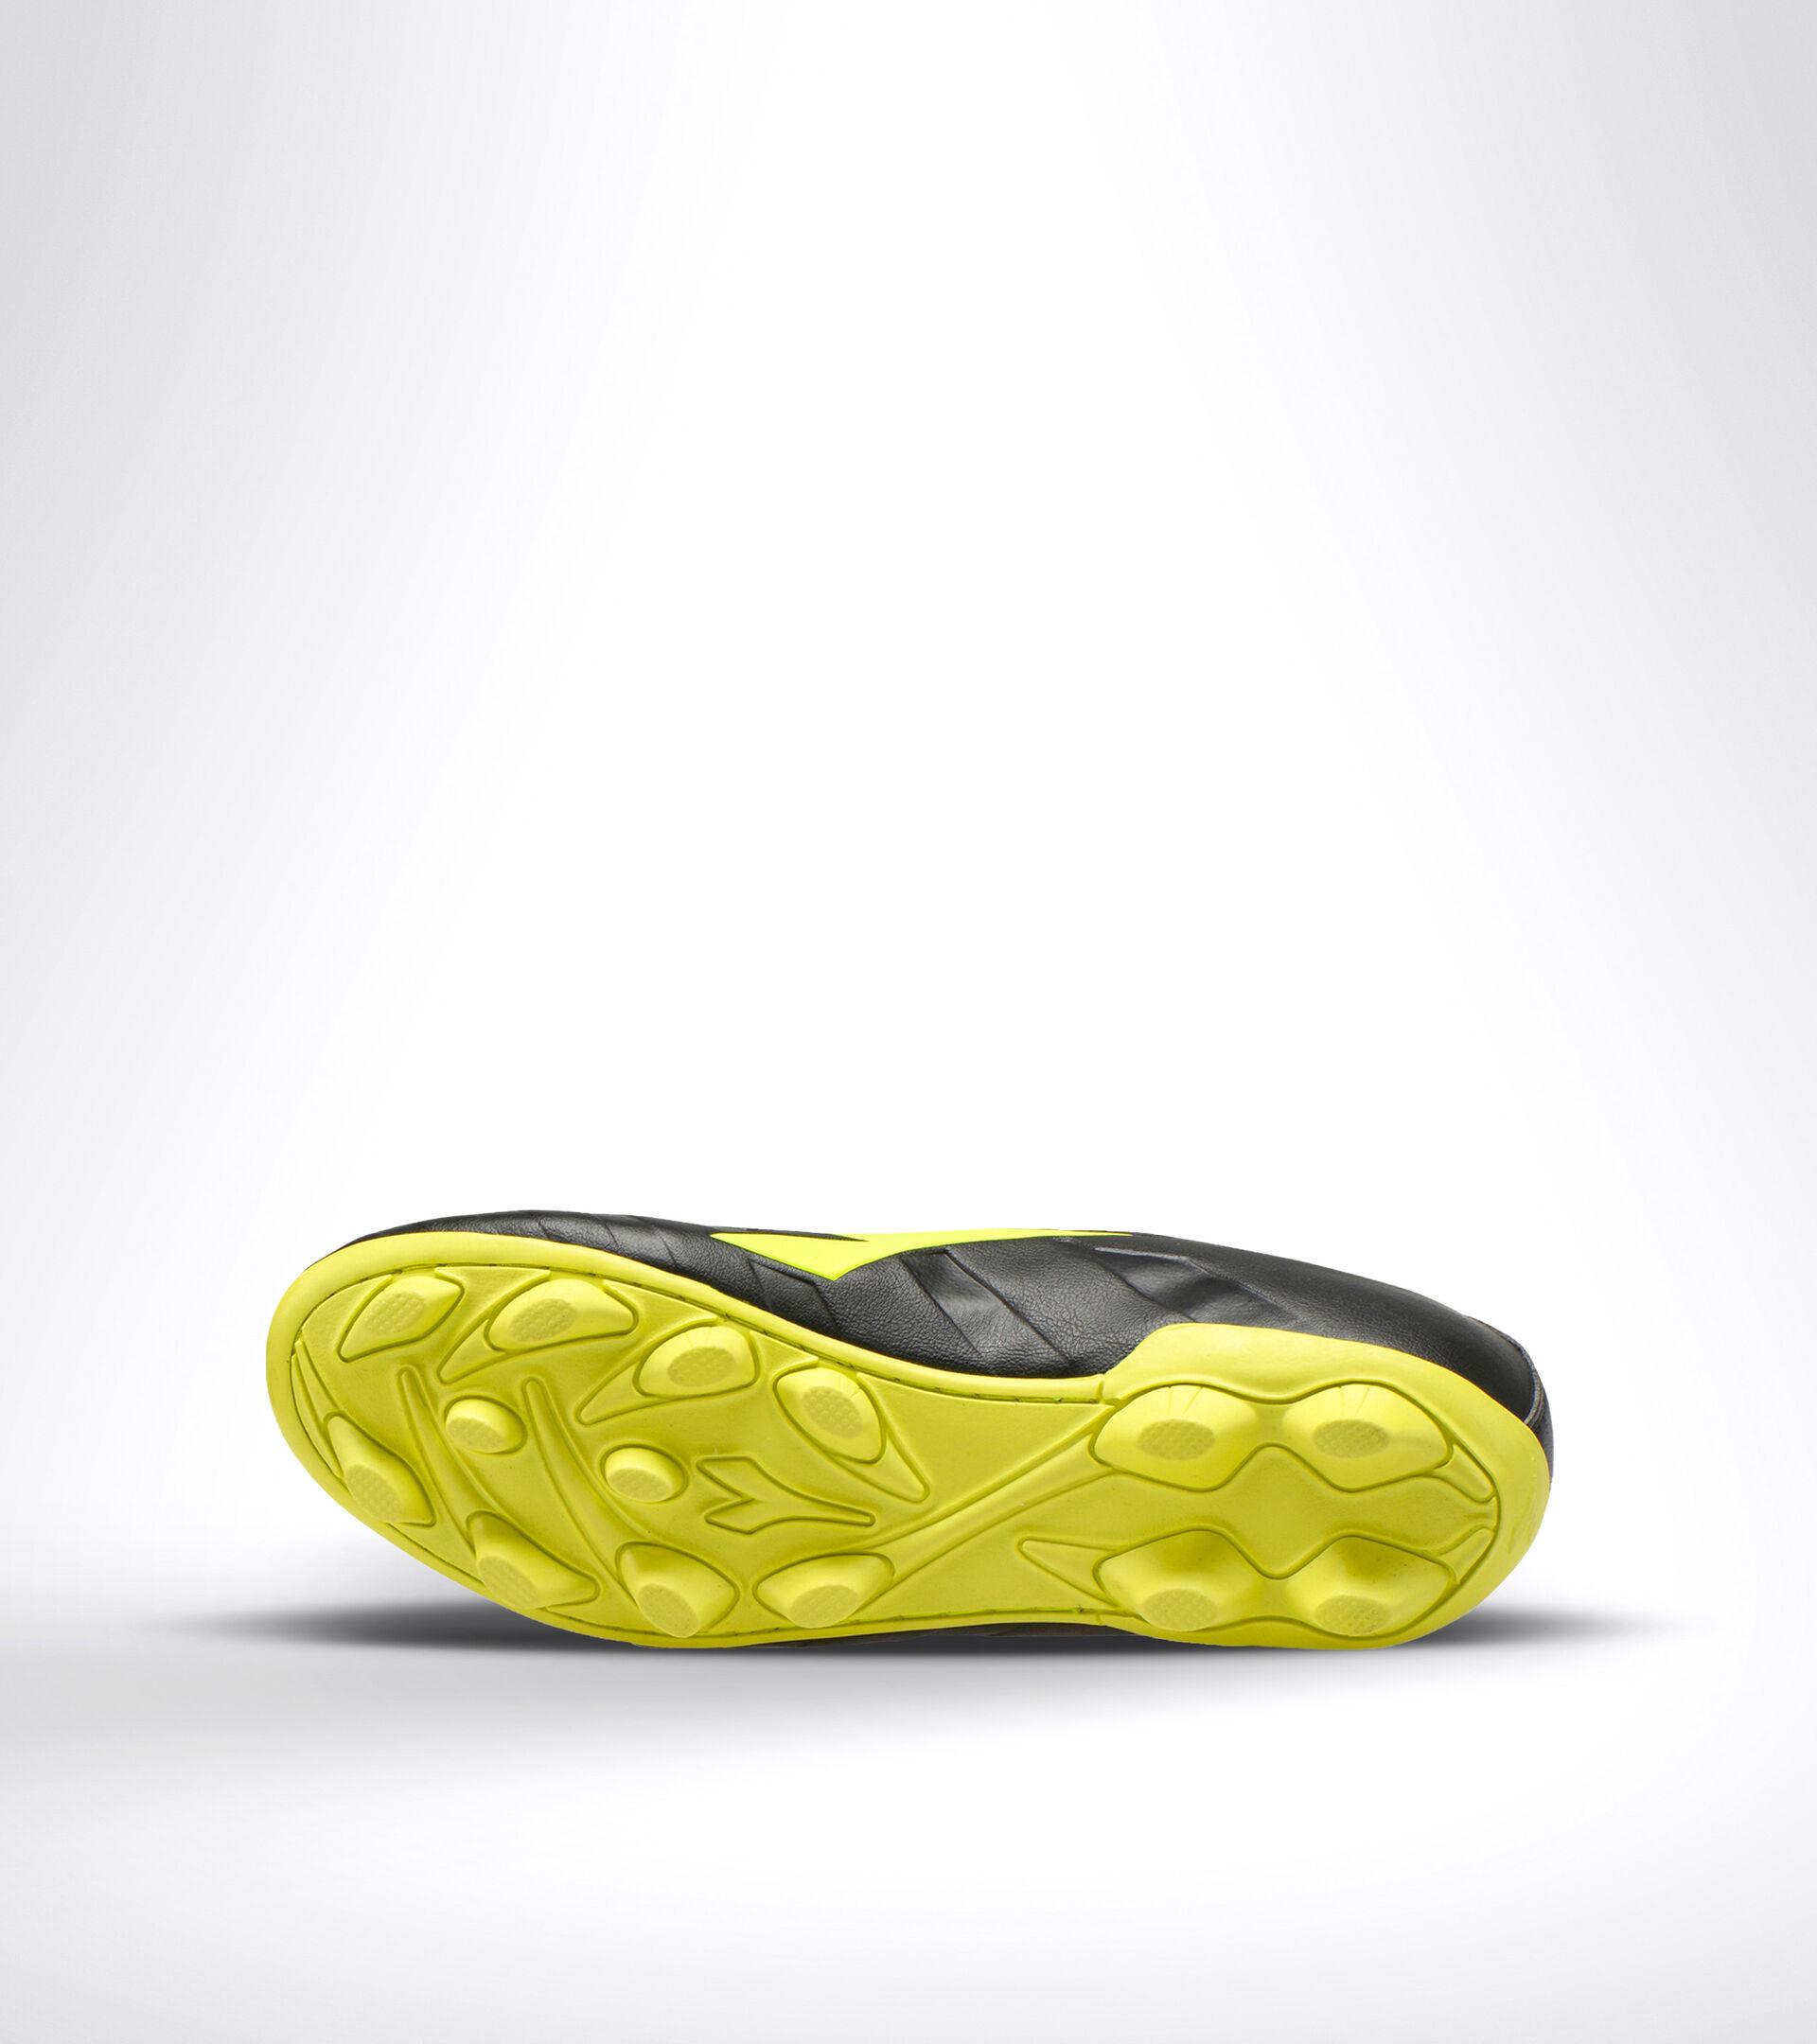 Footwear Sport UOMO PICHICHI 3 MD BLACK/FLUO YELLOW DIADORA Diadora